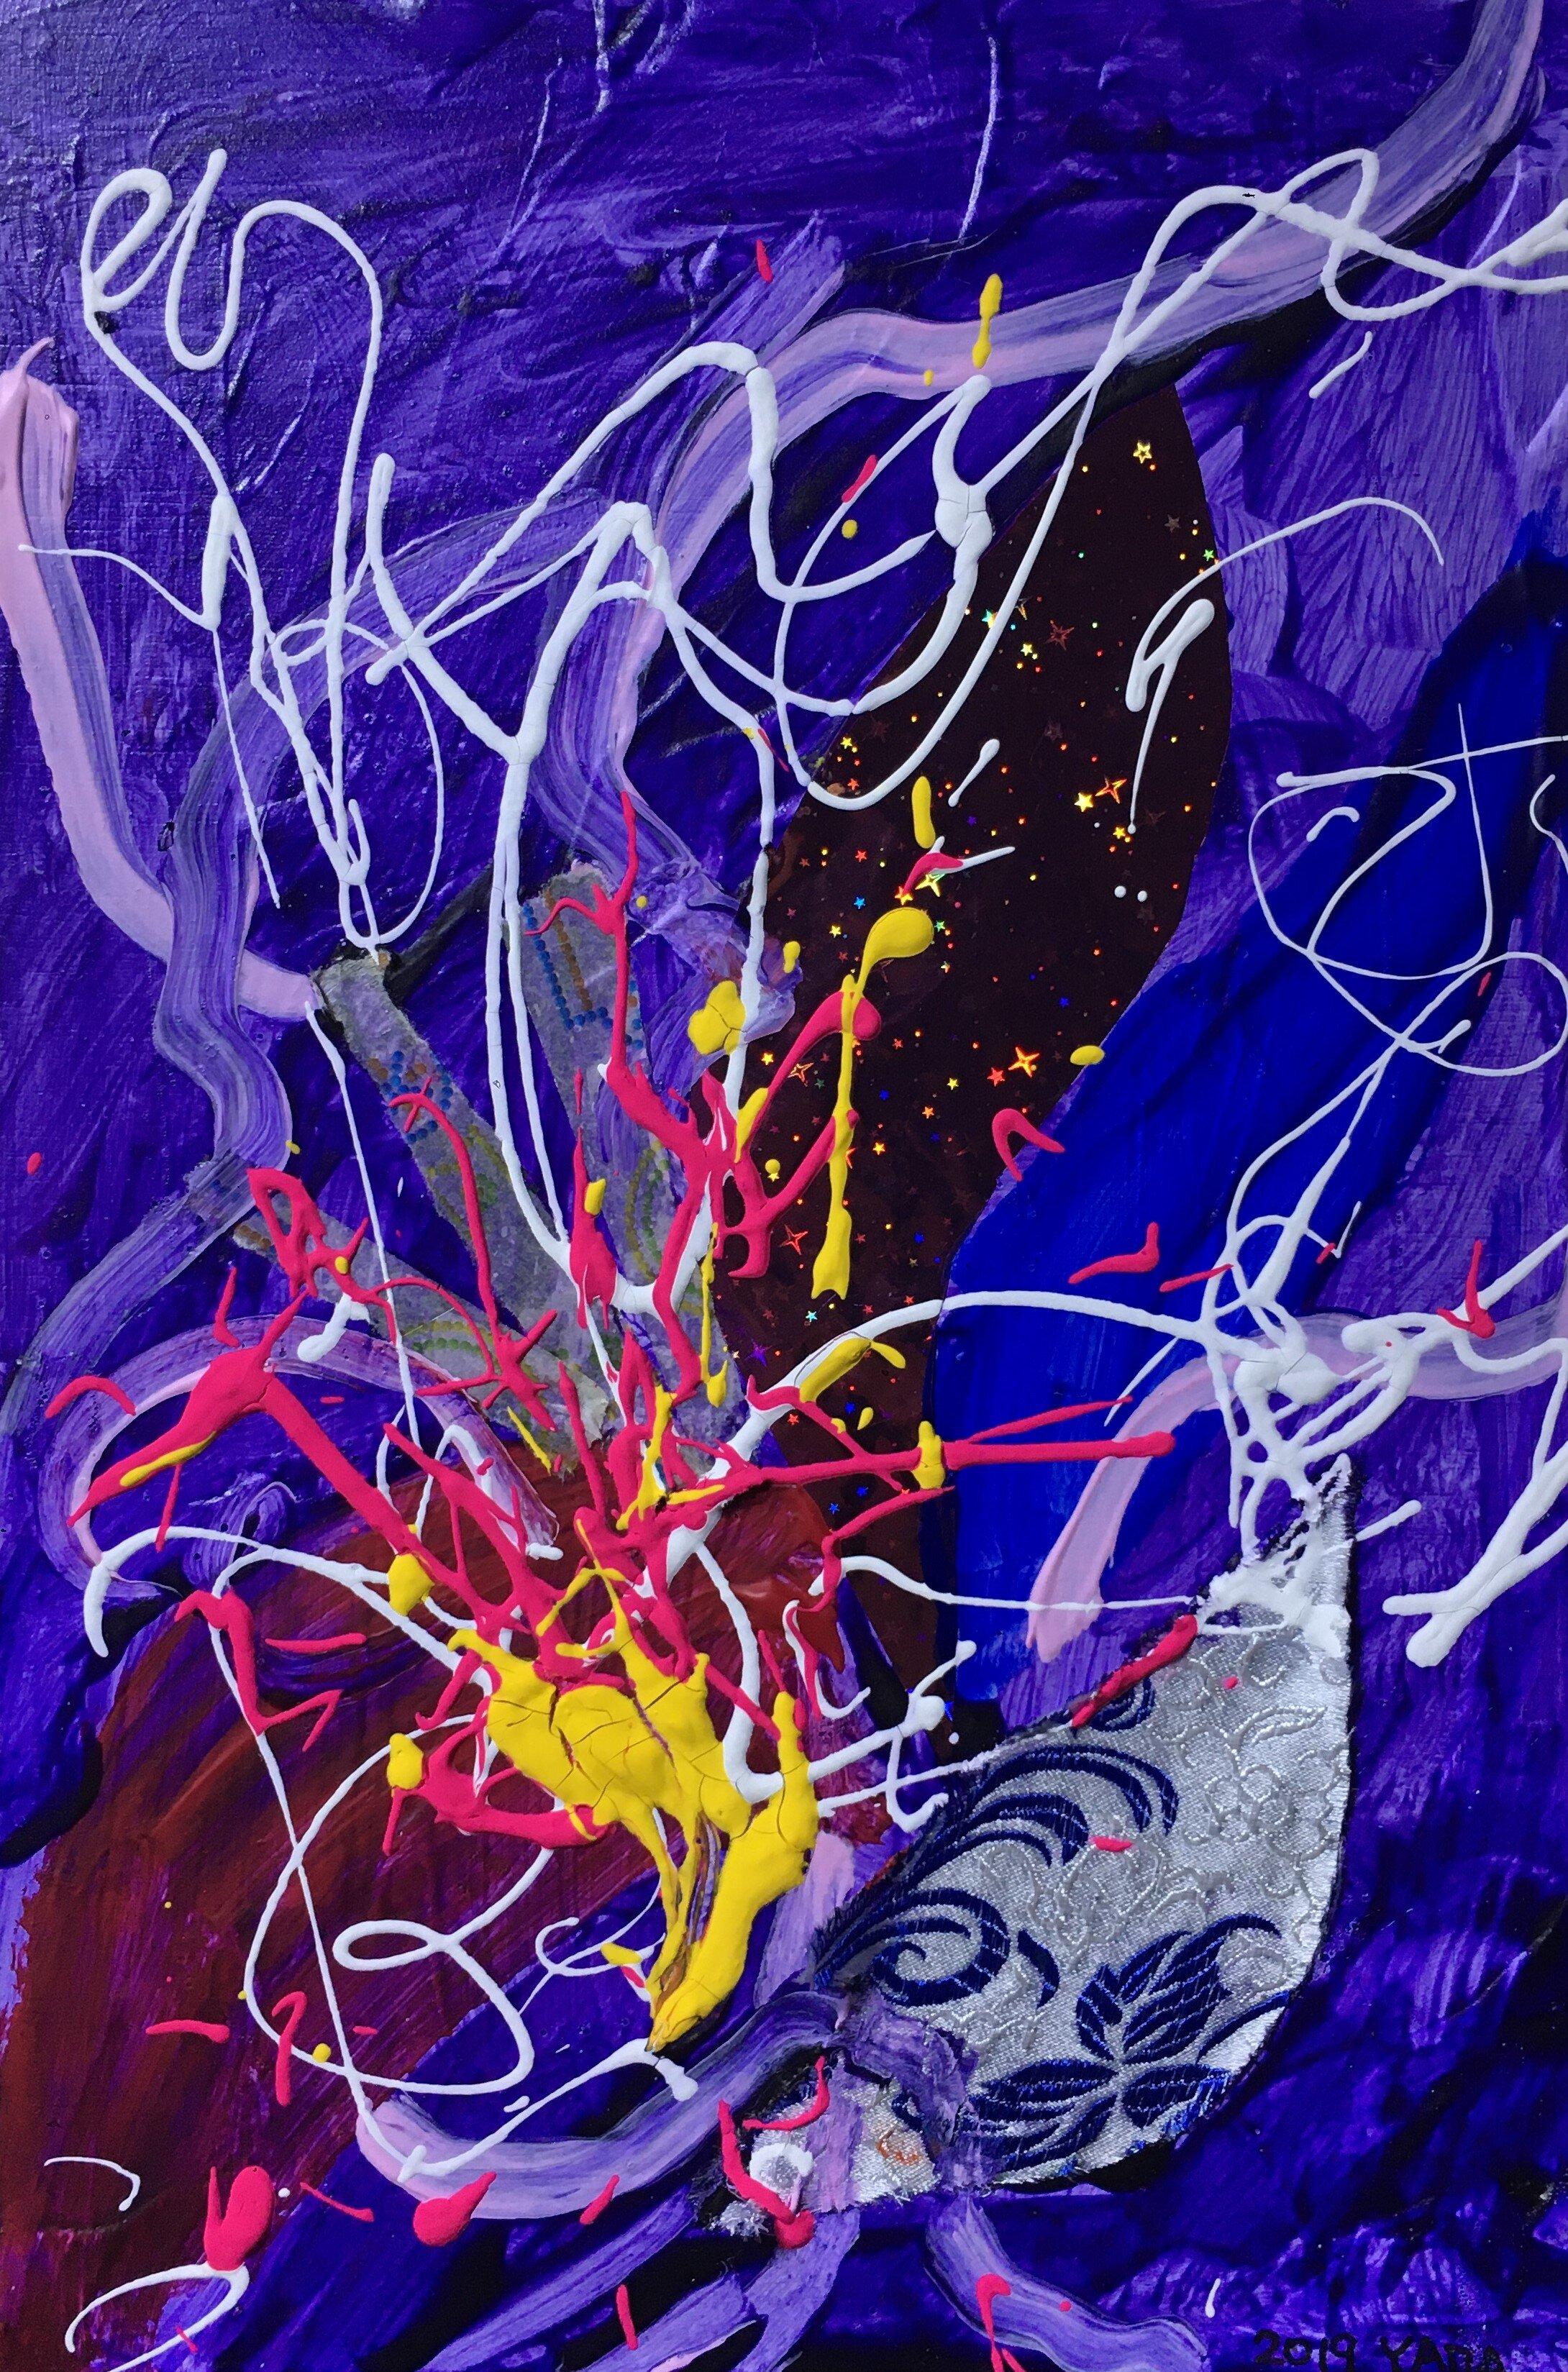 Late at Night, 2019, Mixed Media, 20 x 30 cm, $110